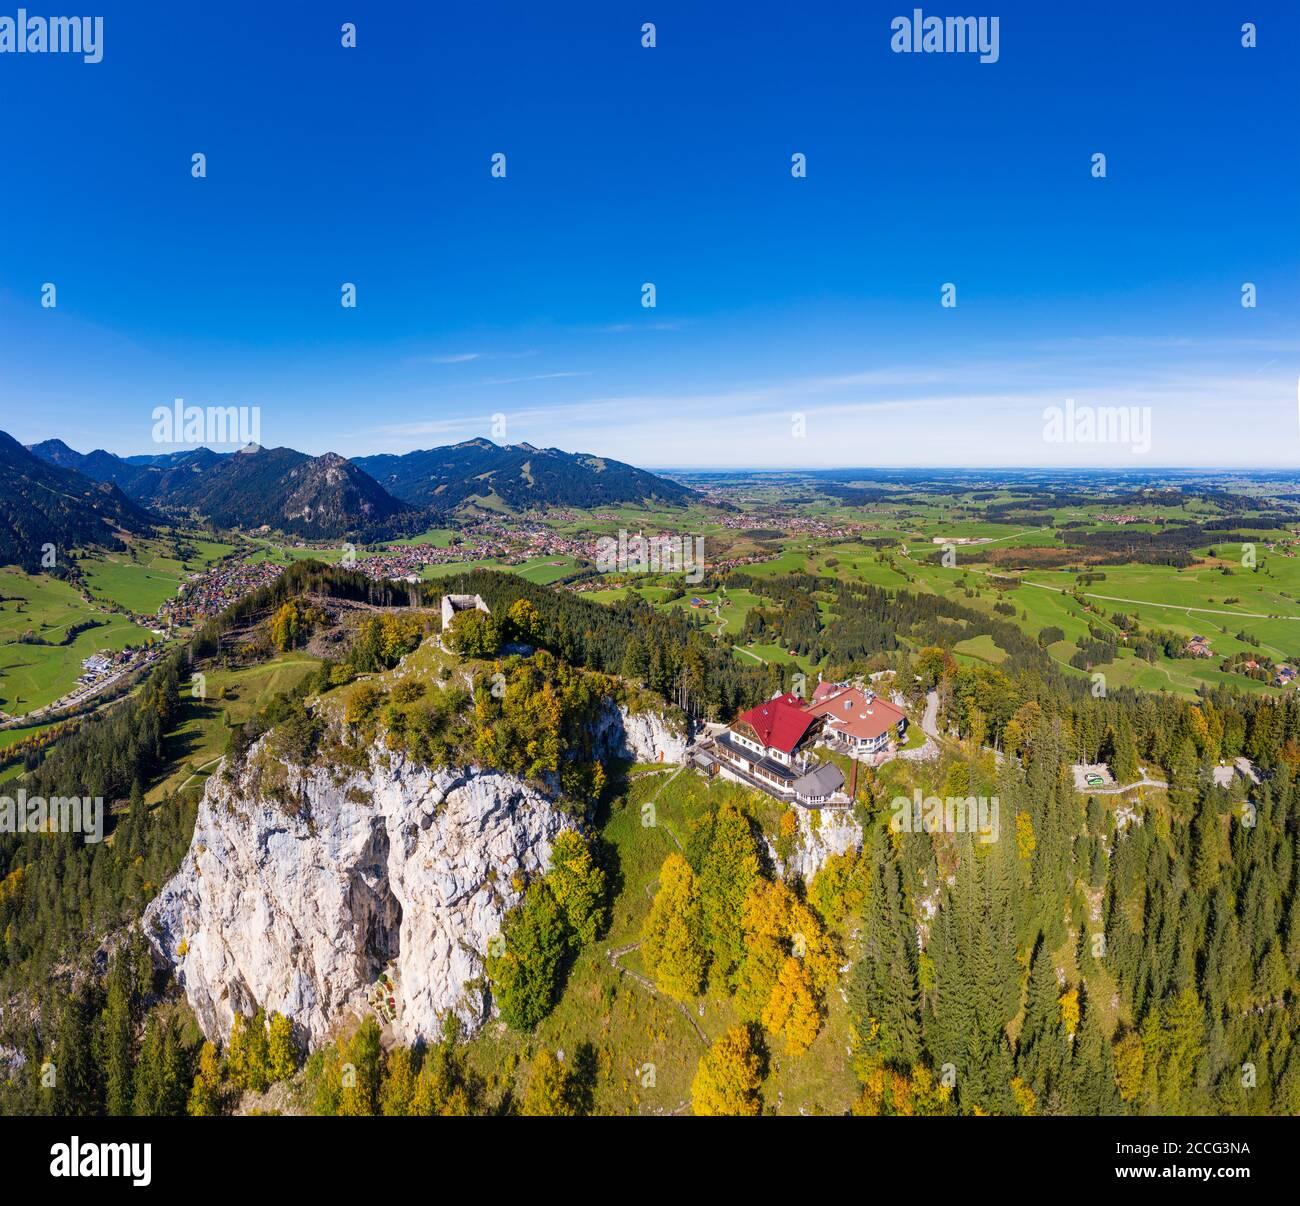 Rovine del castello di Falkenstein e Falkenstein Castle Hotel, sul retro Pfronten, Ostallgäu, Allgäu, vista aerea, Svevia, Baviera, Germania Foto Stock